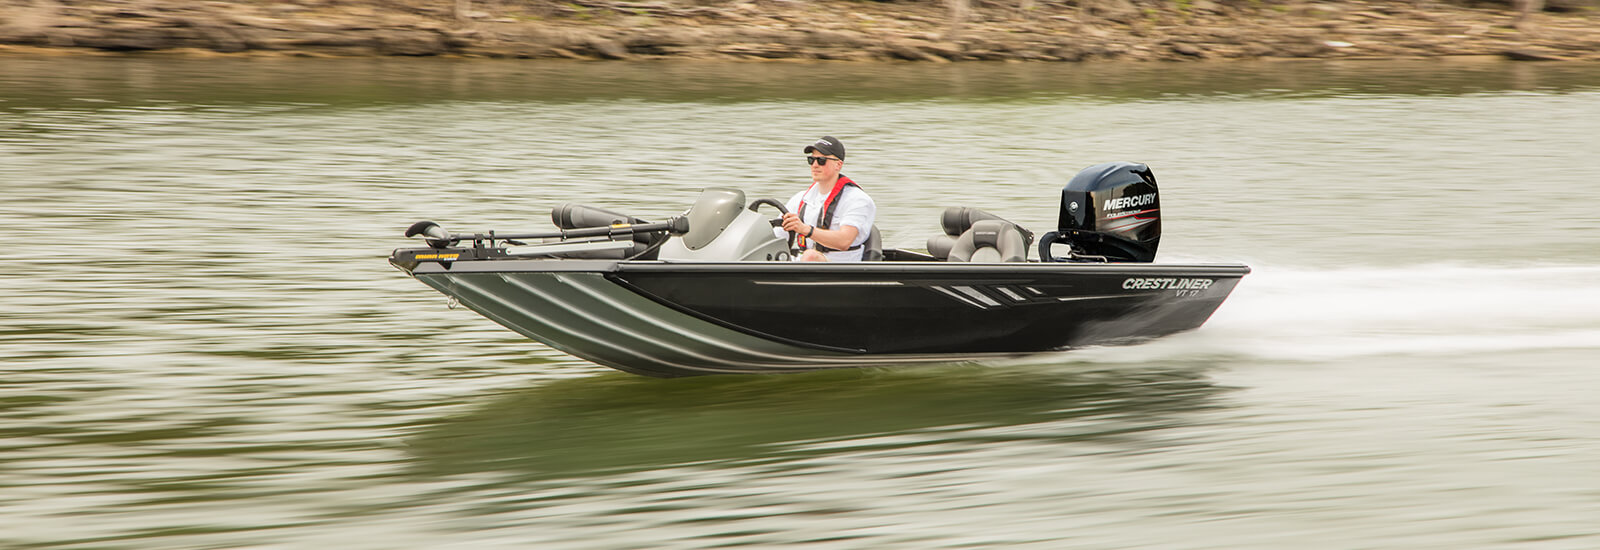 Crestliner Vt 17 Foot Flat Bottom Aluminum Bass Boats Trailer Light Wiring Harness 4 Way Wire Connector Boat Stroke Karavan